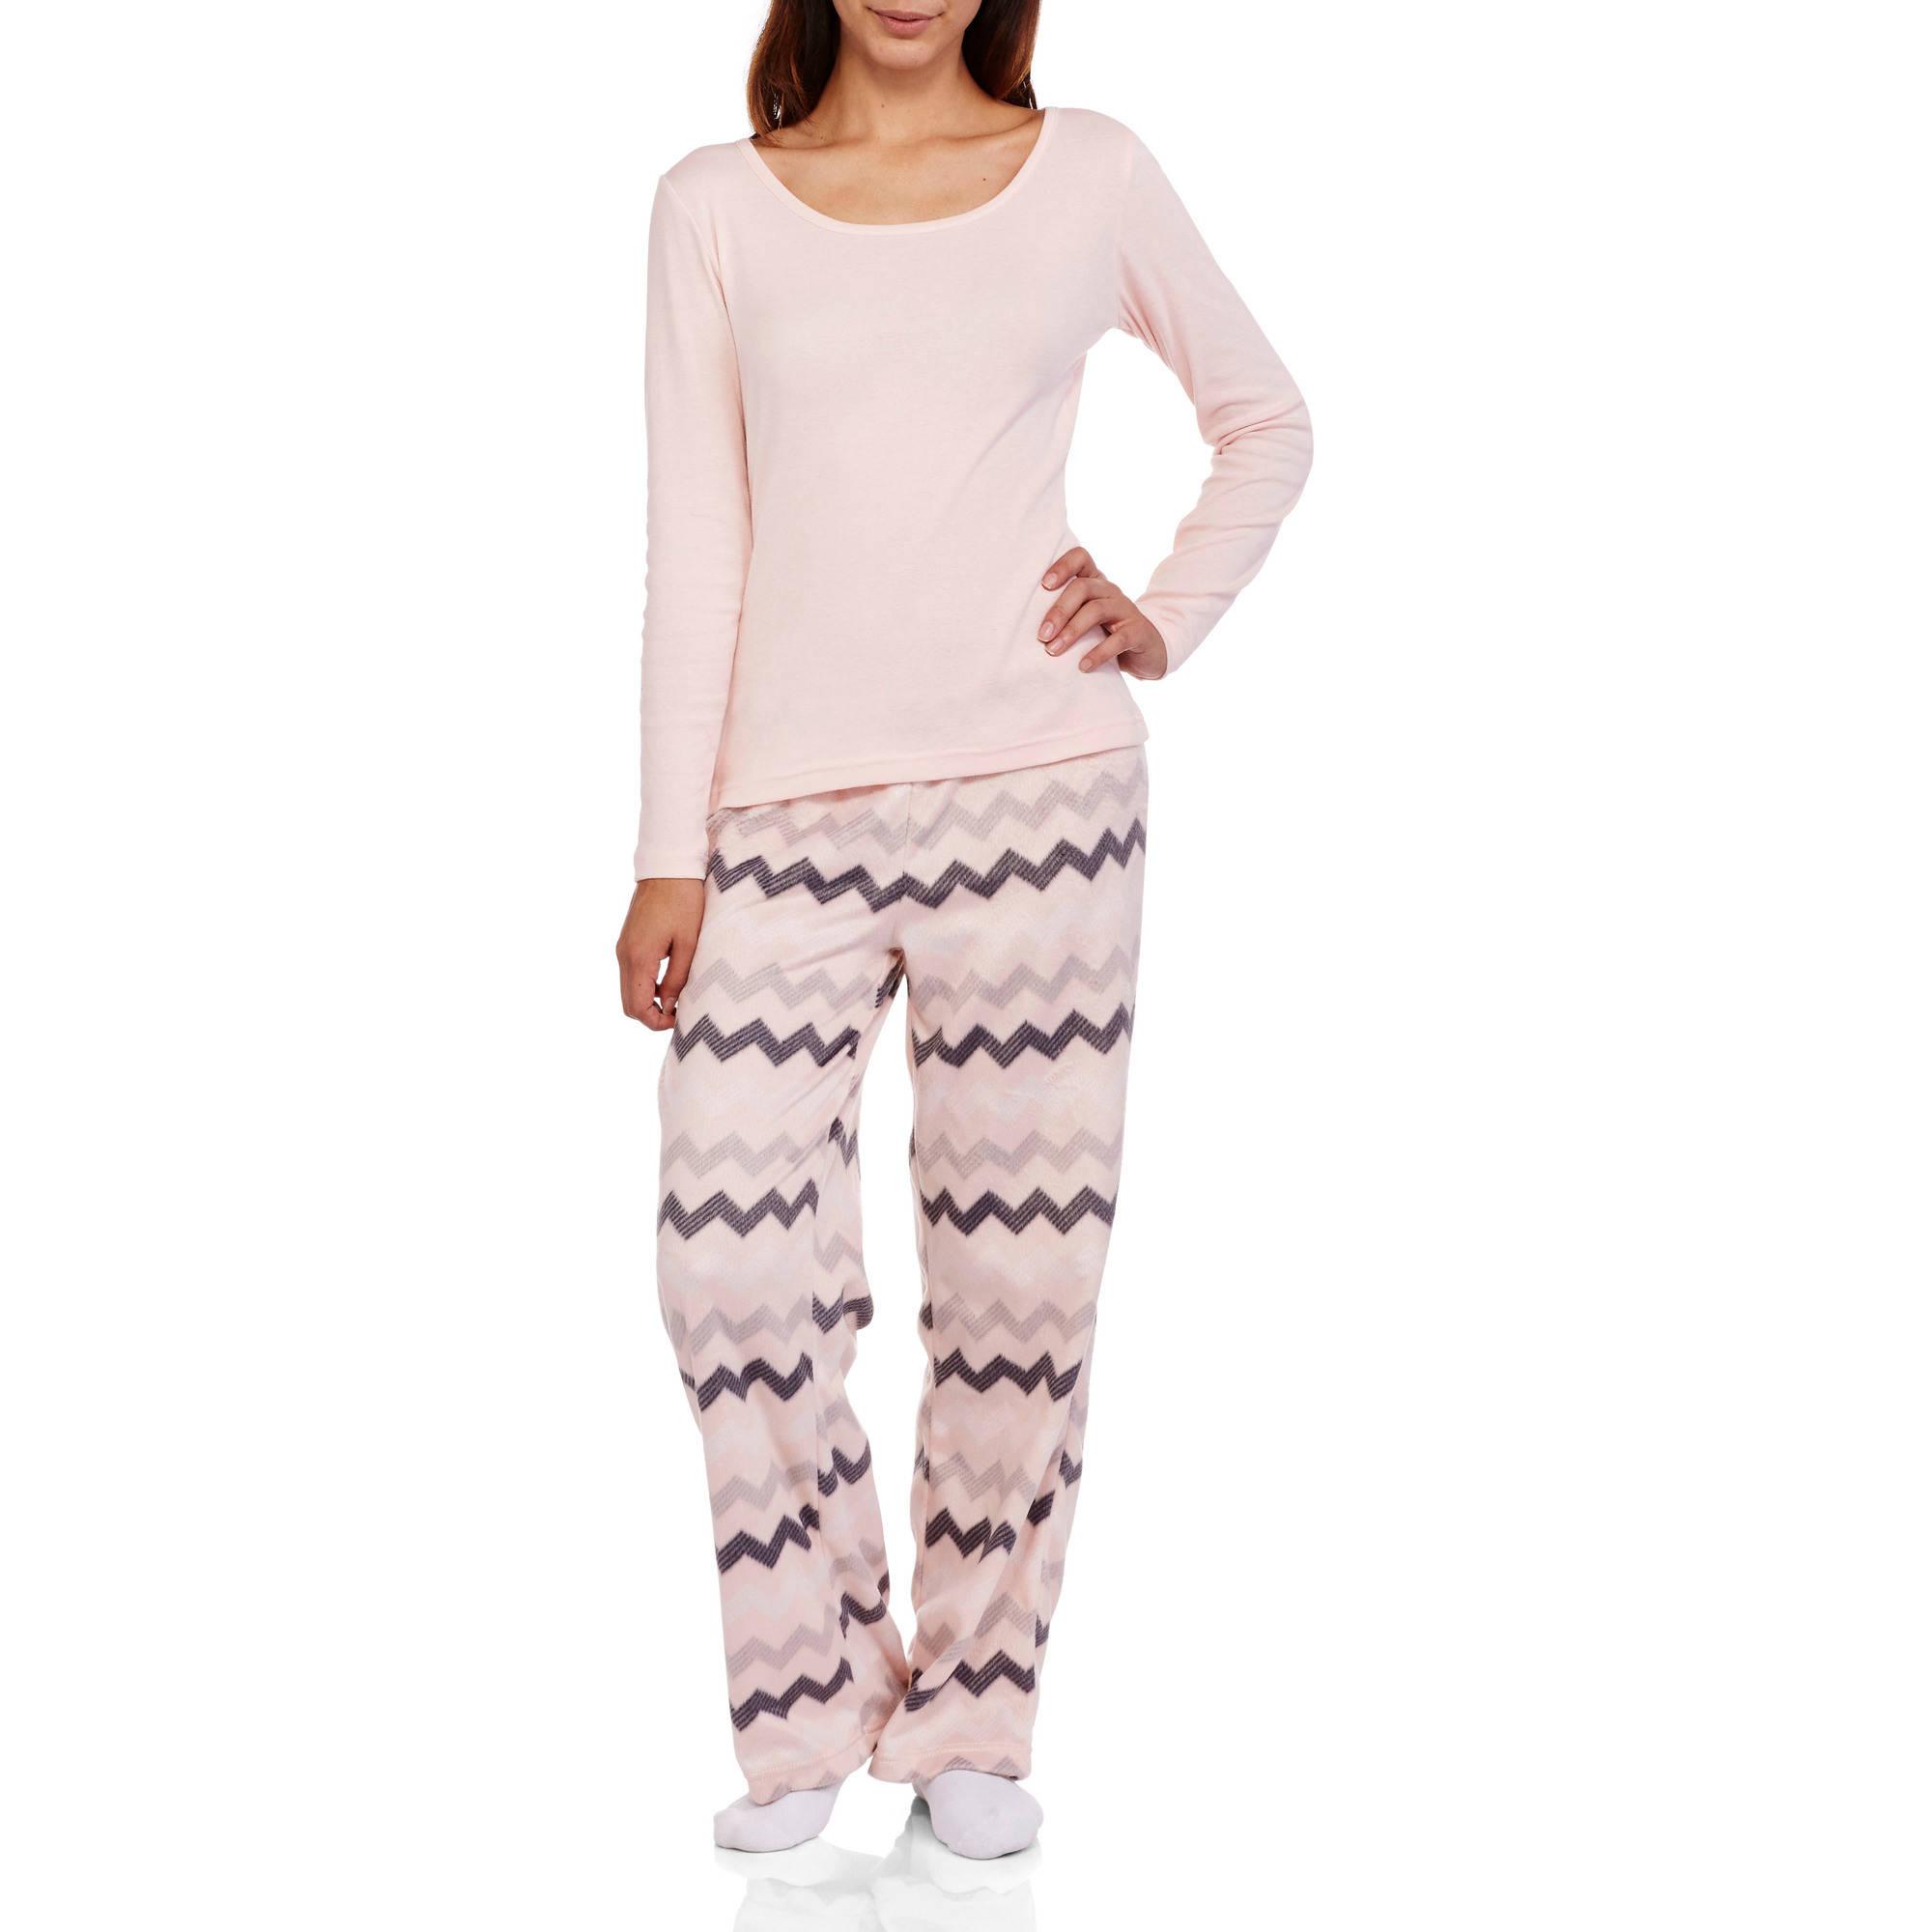 Juniors\' Pajama Knit Union Suit One Piece Sleepwear with Hood ...